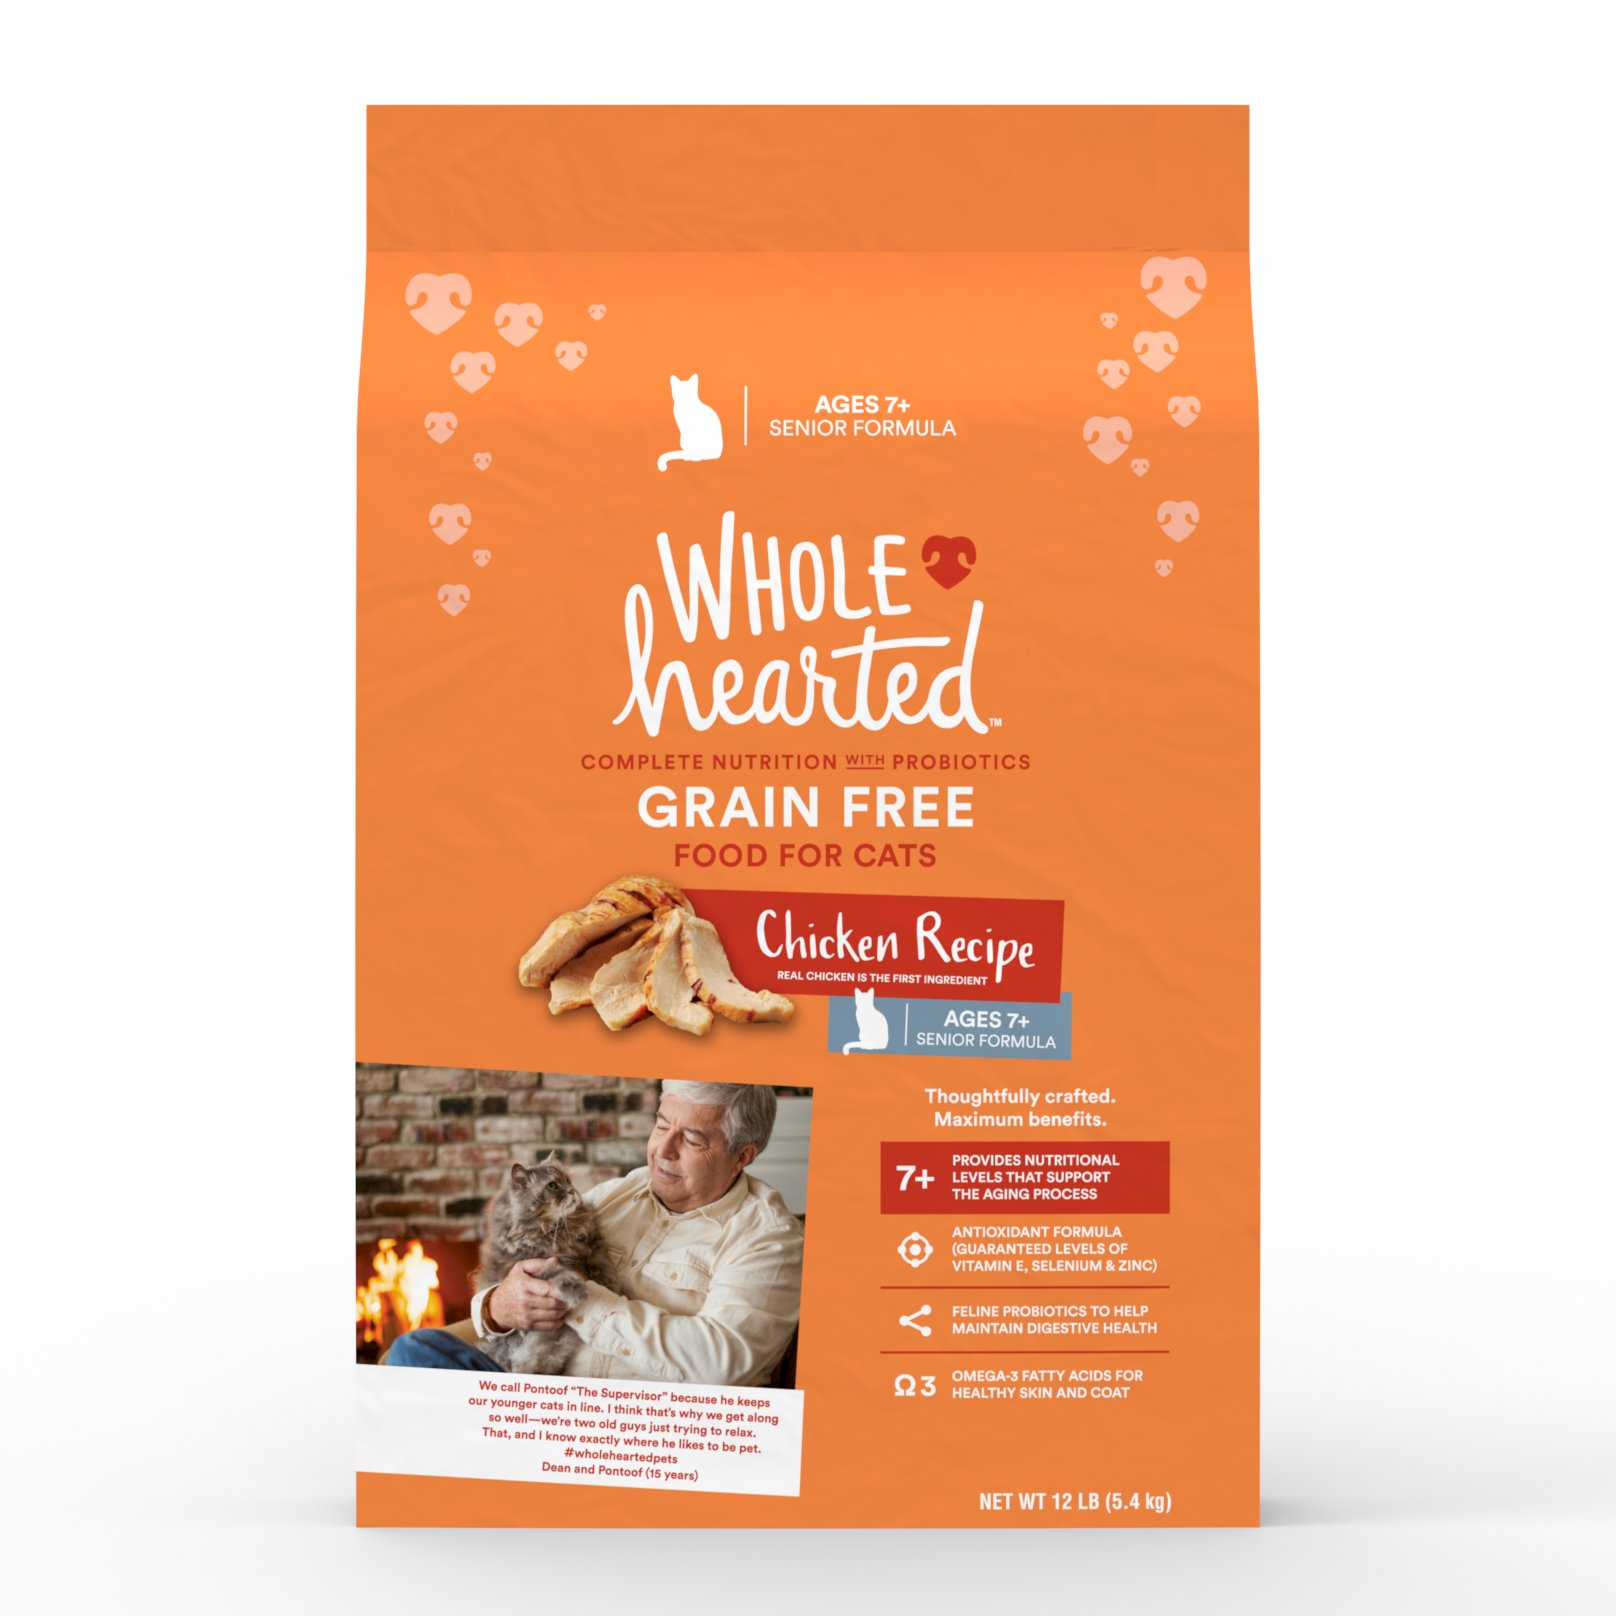 Grain Free Cat Food Comparison